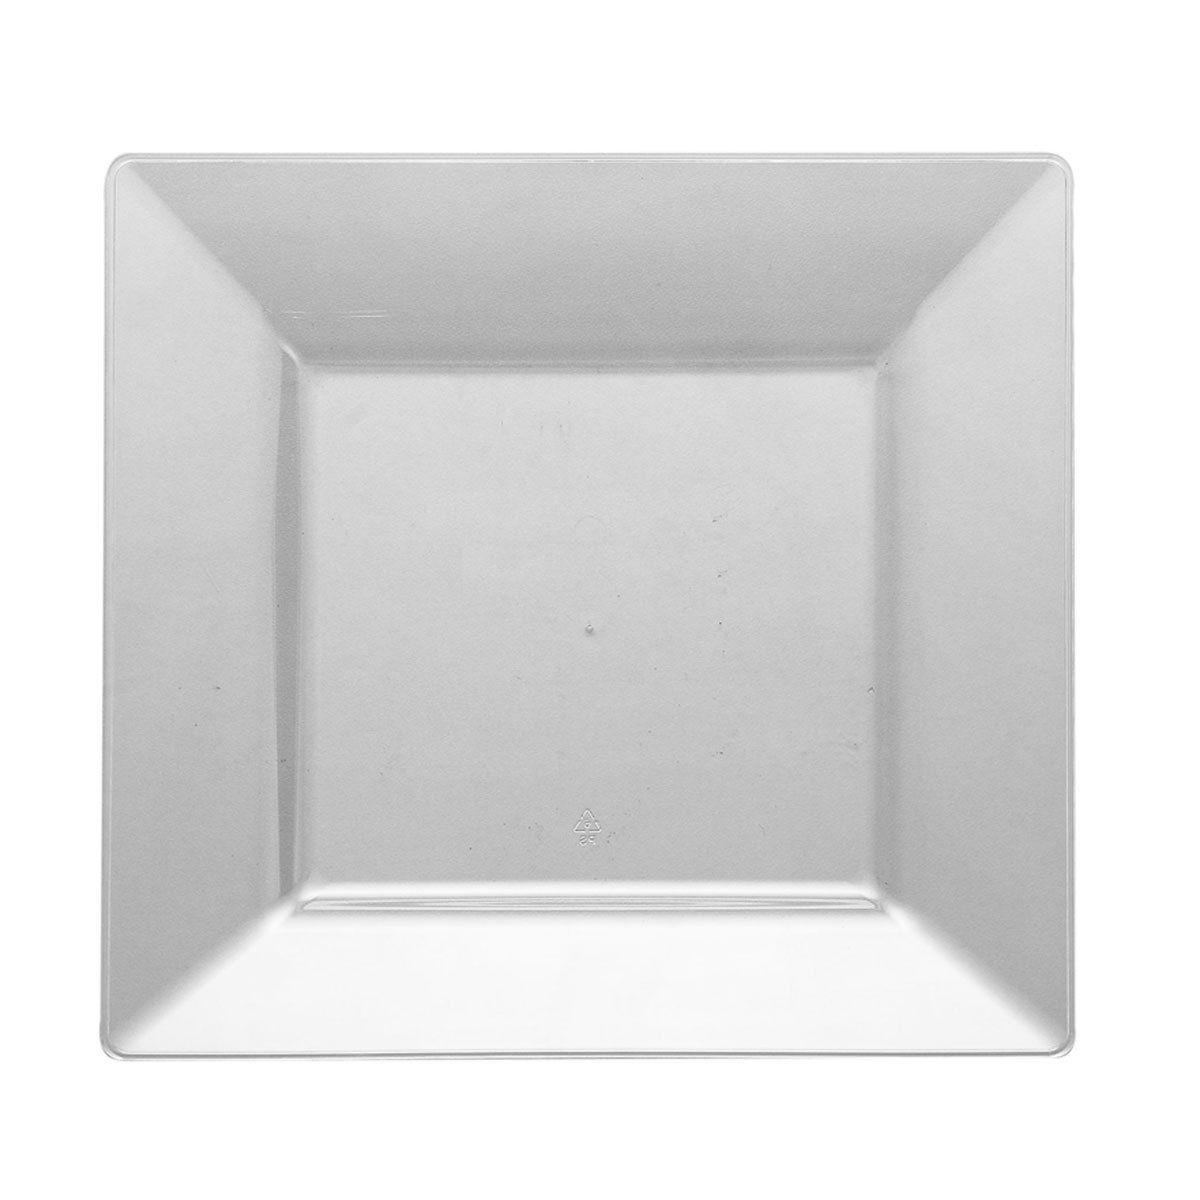 6 1 2 Dia Clear Plastic Square Dessert Plates Square Plates Plates Wedding Plates